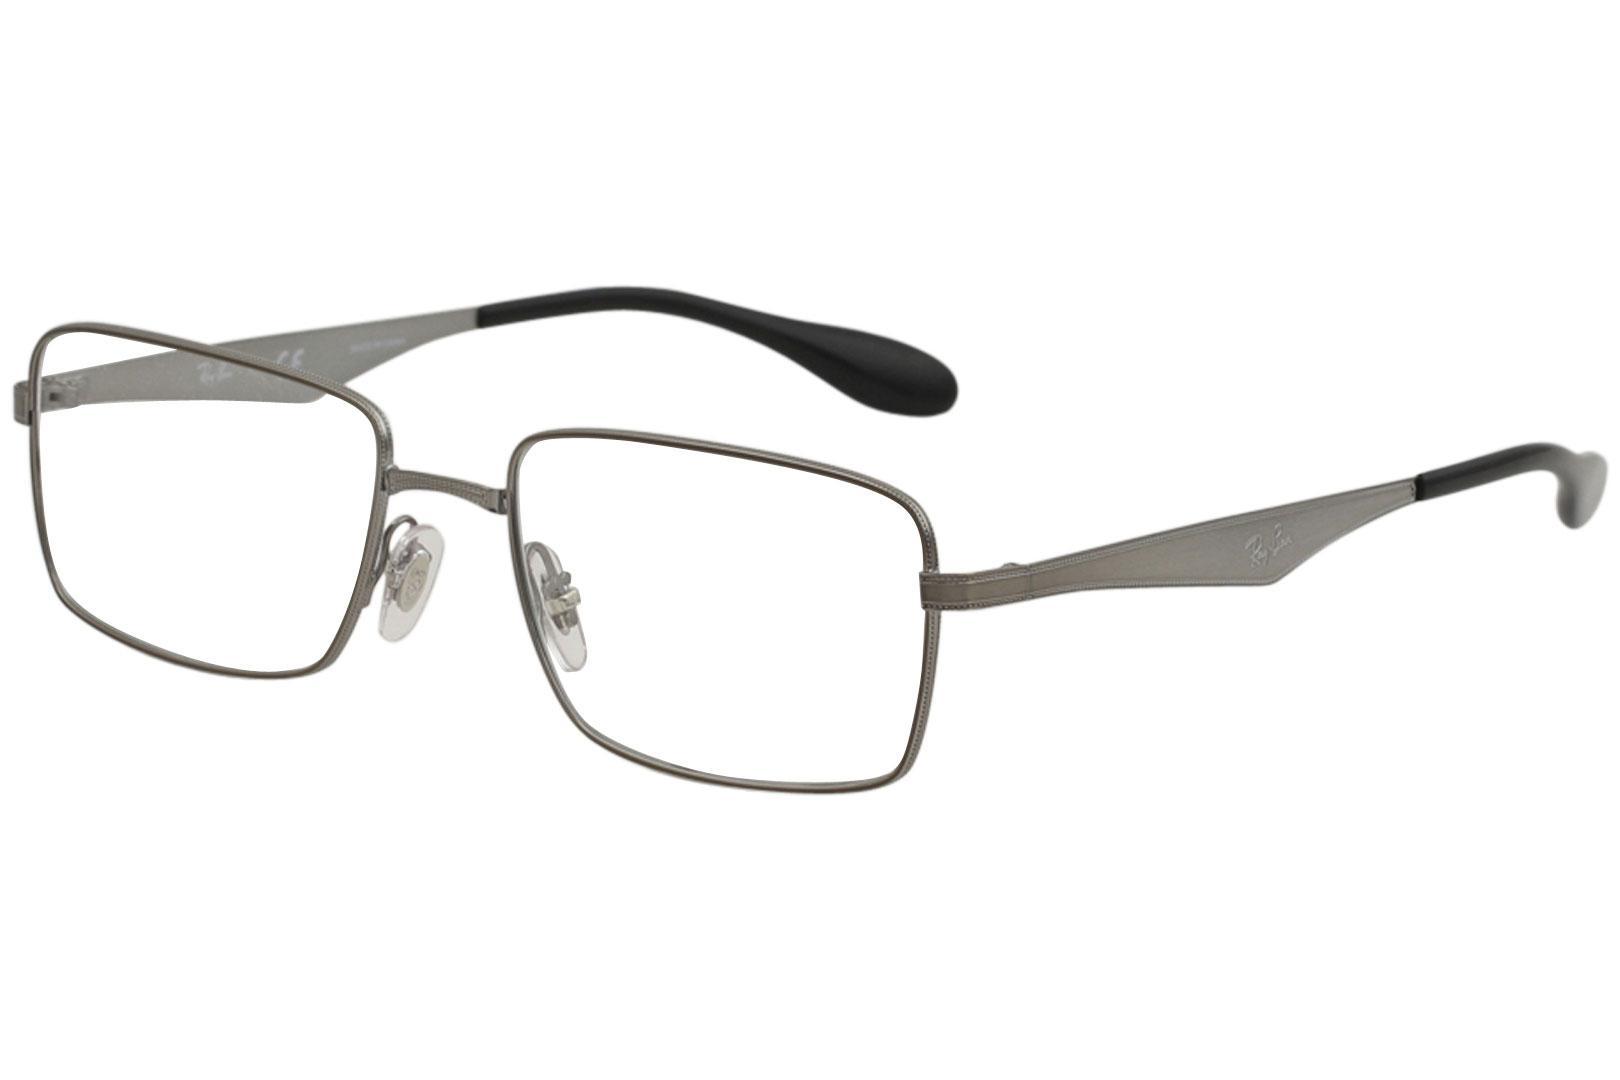 dd327b36ca Ray Ban Men s Eyeglasses RX6329 RX 6329 RayBan Full Rim Optical Frame by Ray  Ban. 12345